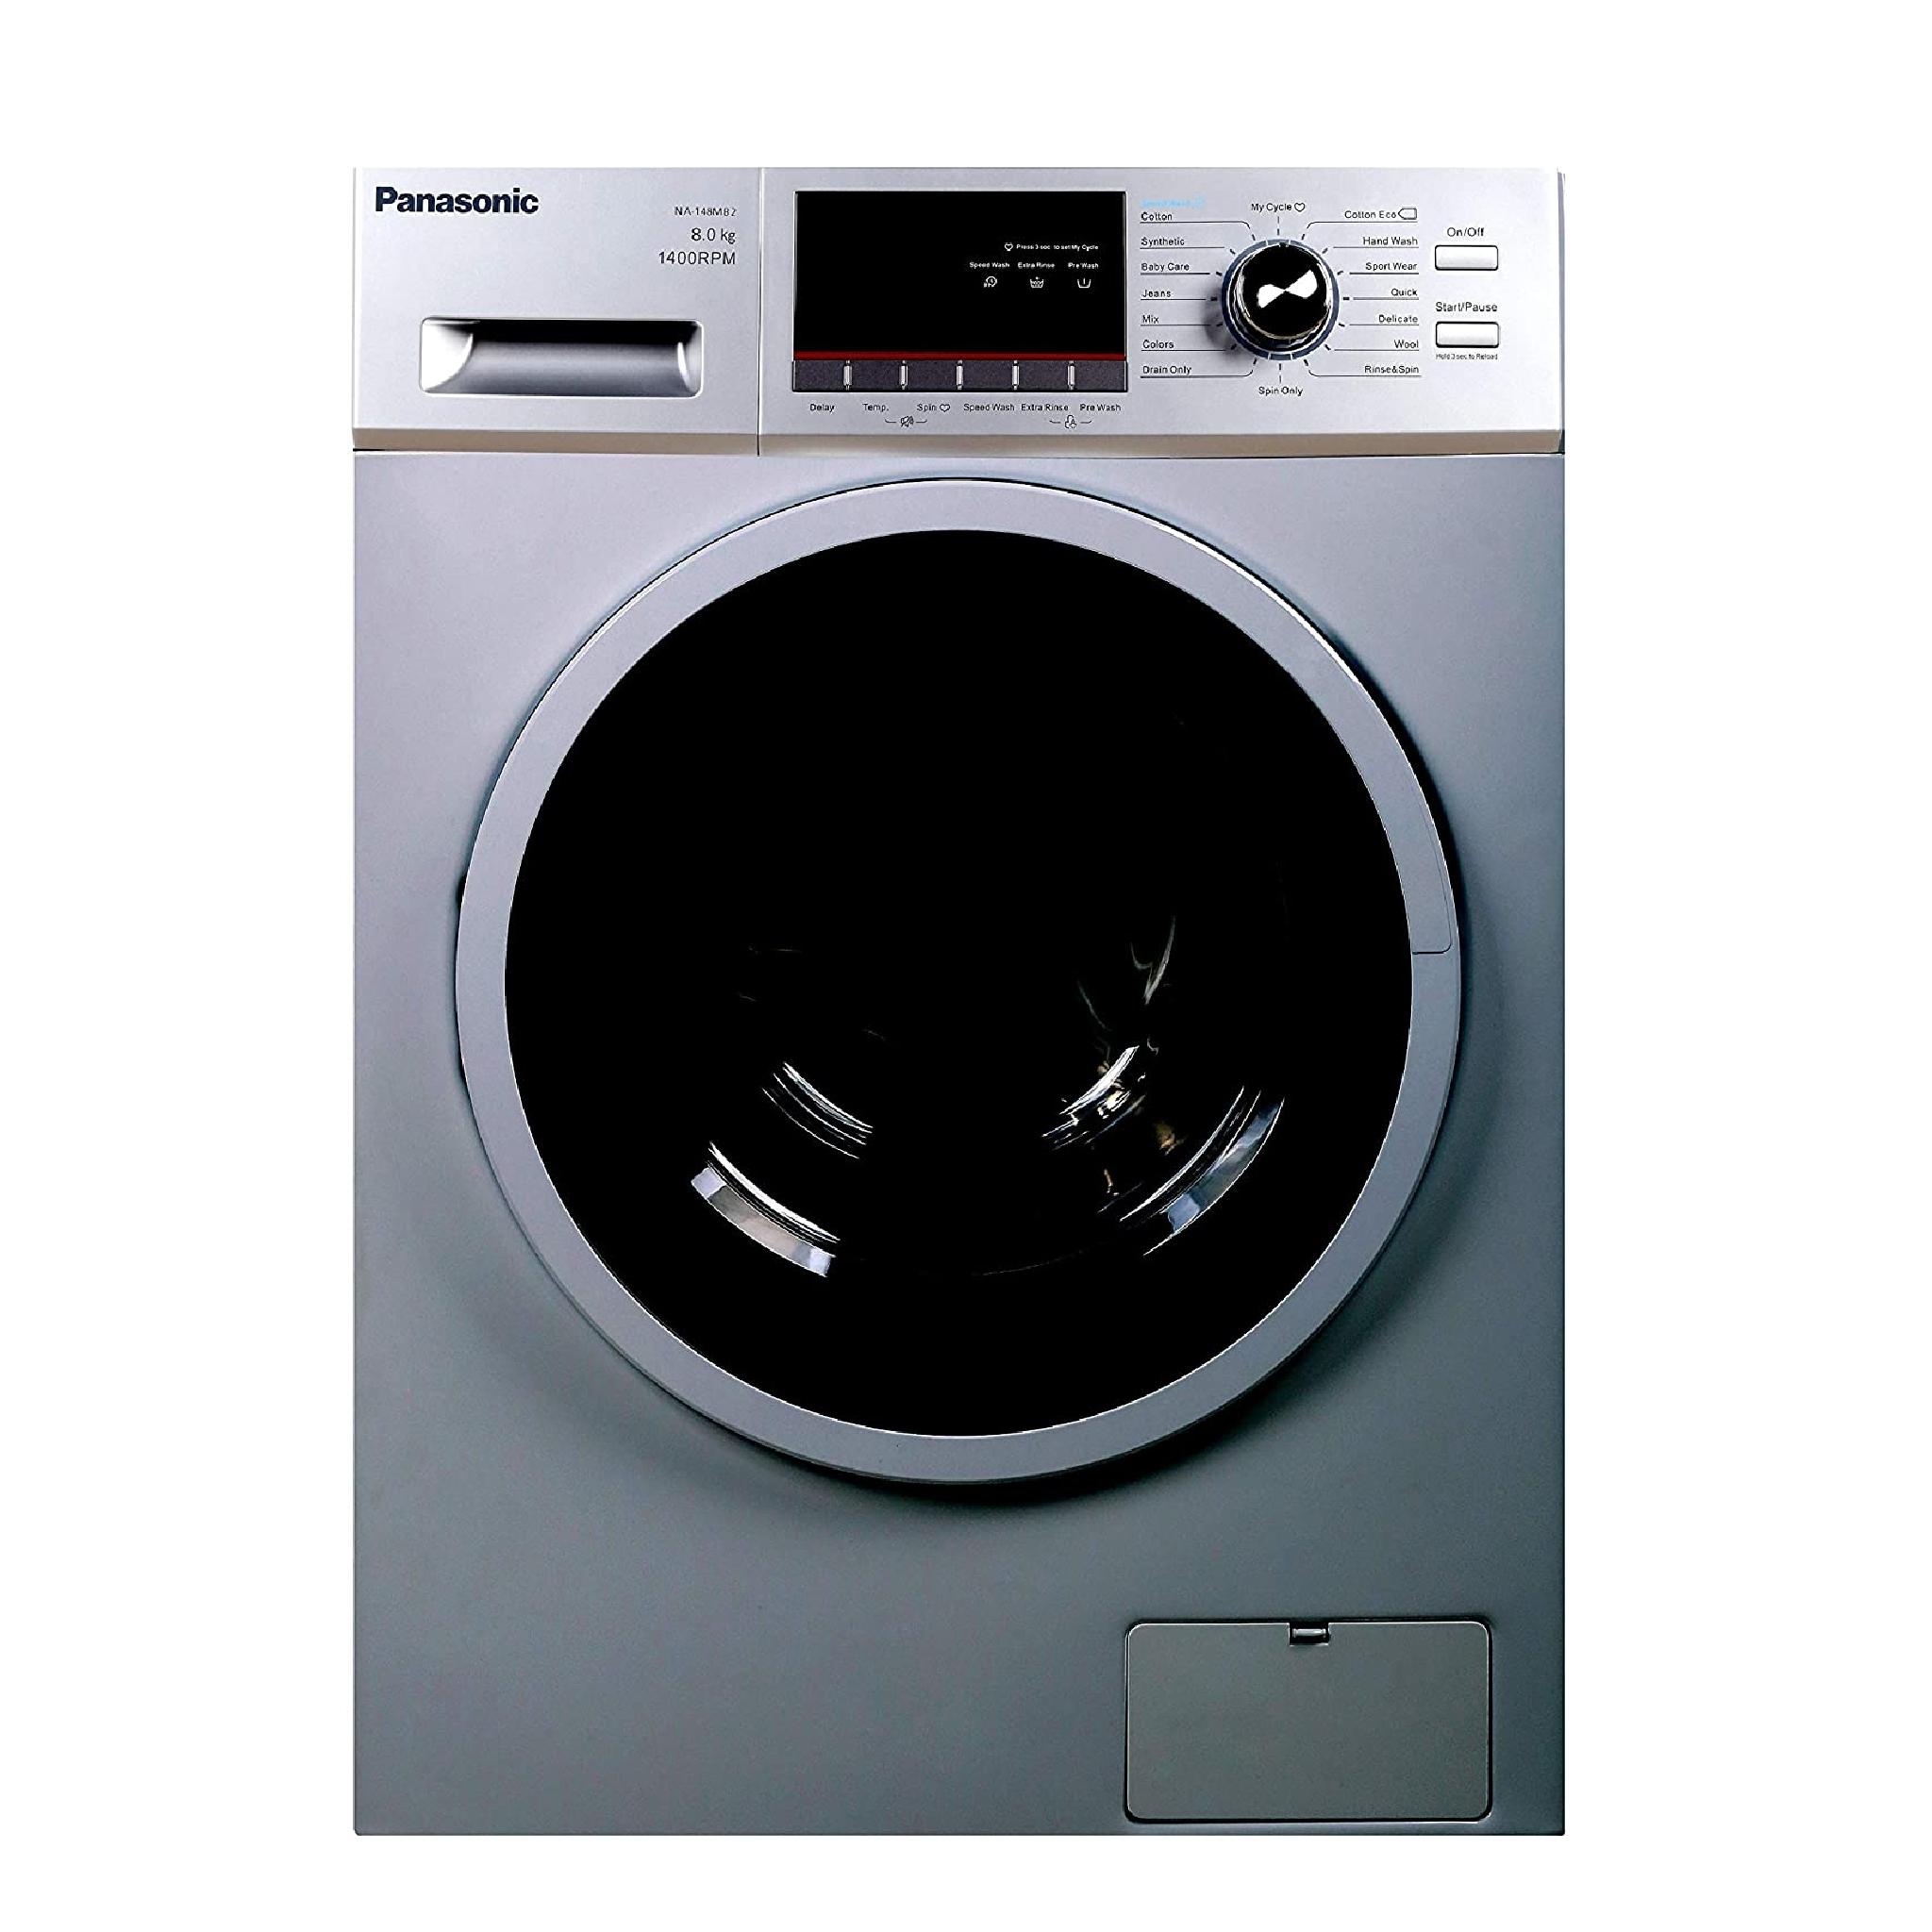 Best front loading washing machines - Panasonic Front Load Washing Machine